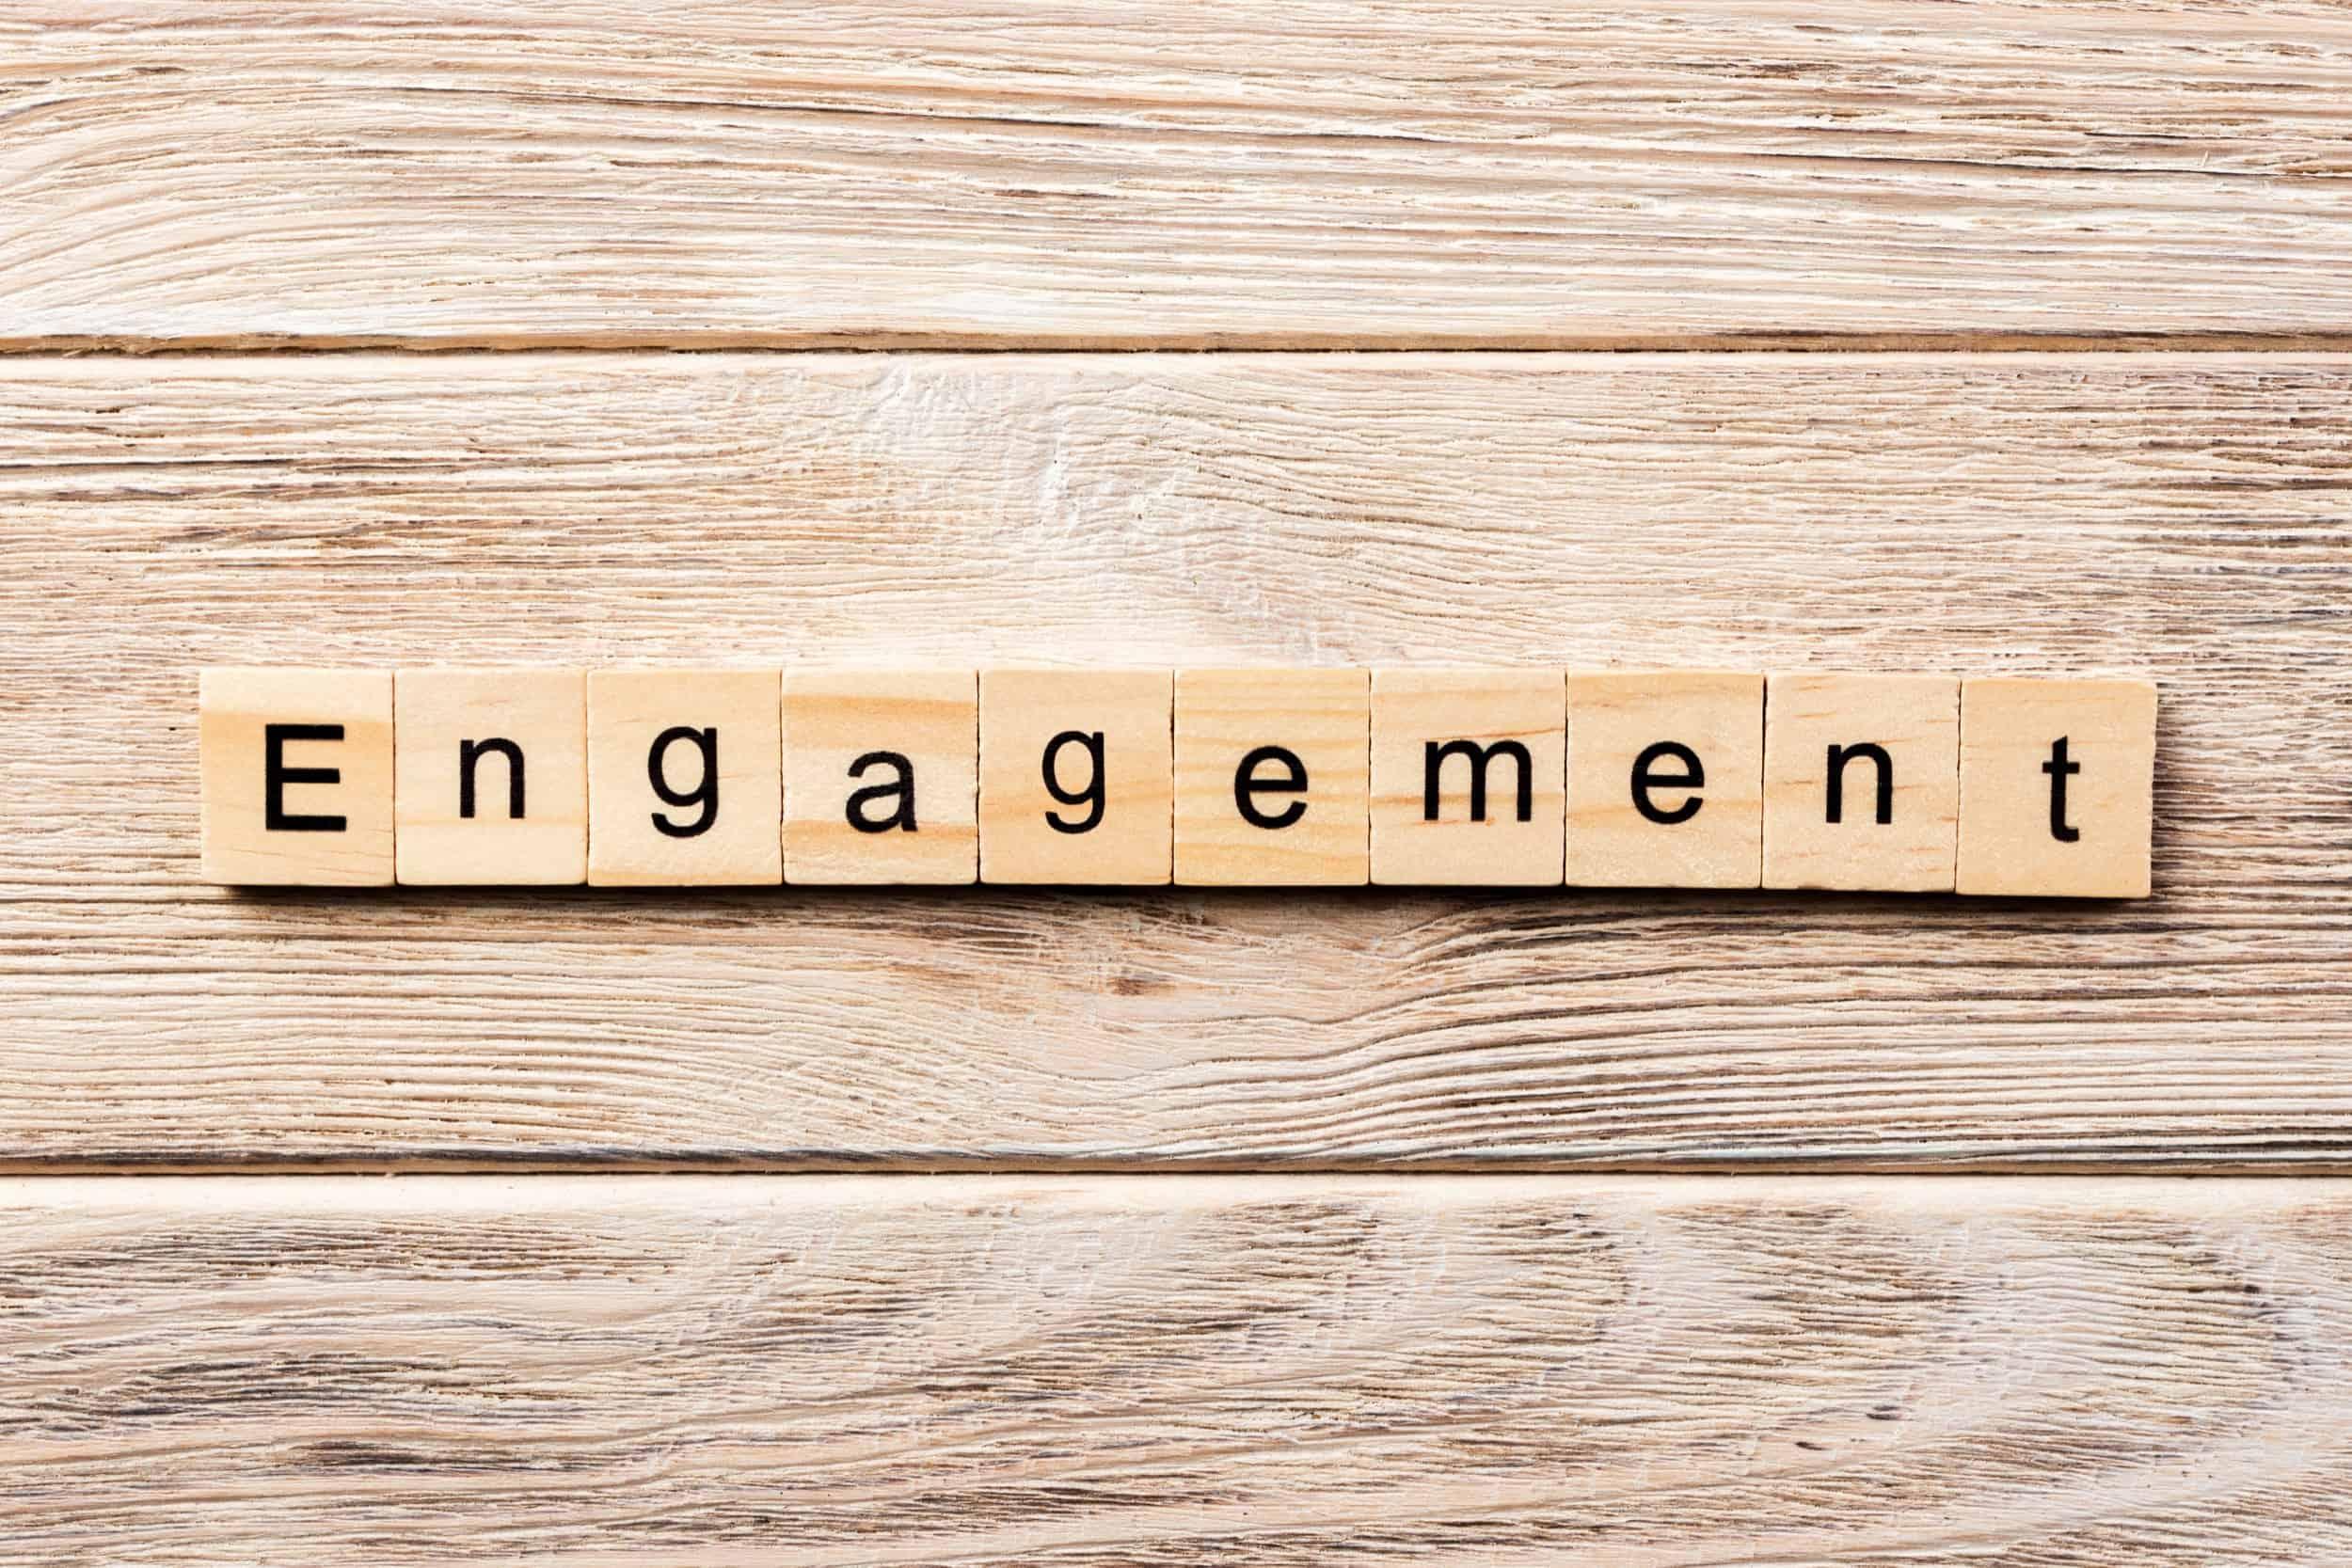 Employee Engagement: Perception Versus Reality